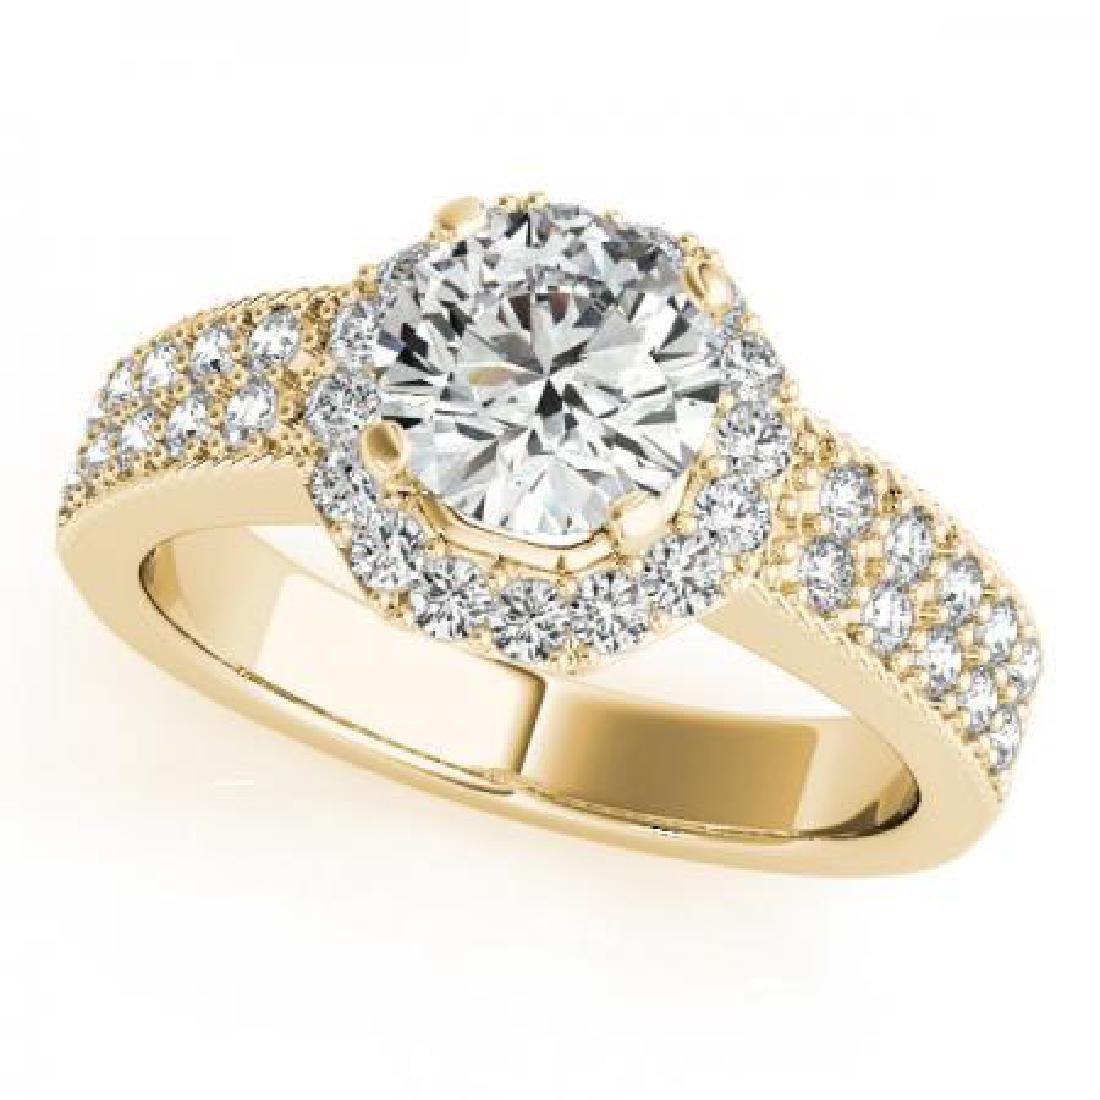 CERTIFIED 18K YELLOW GOLD 1.01 CT G-H/VS-SI1 DIAMOND HA